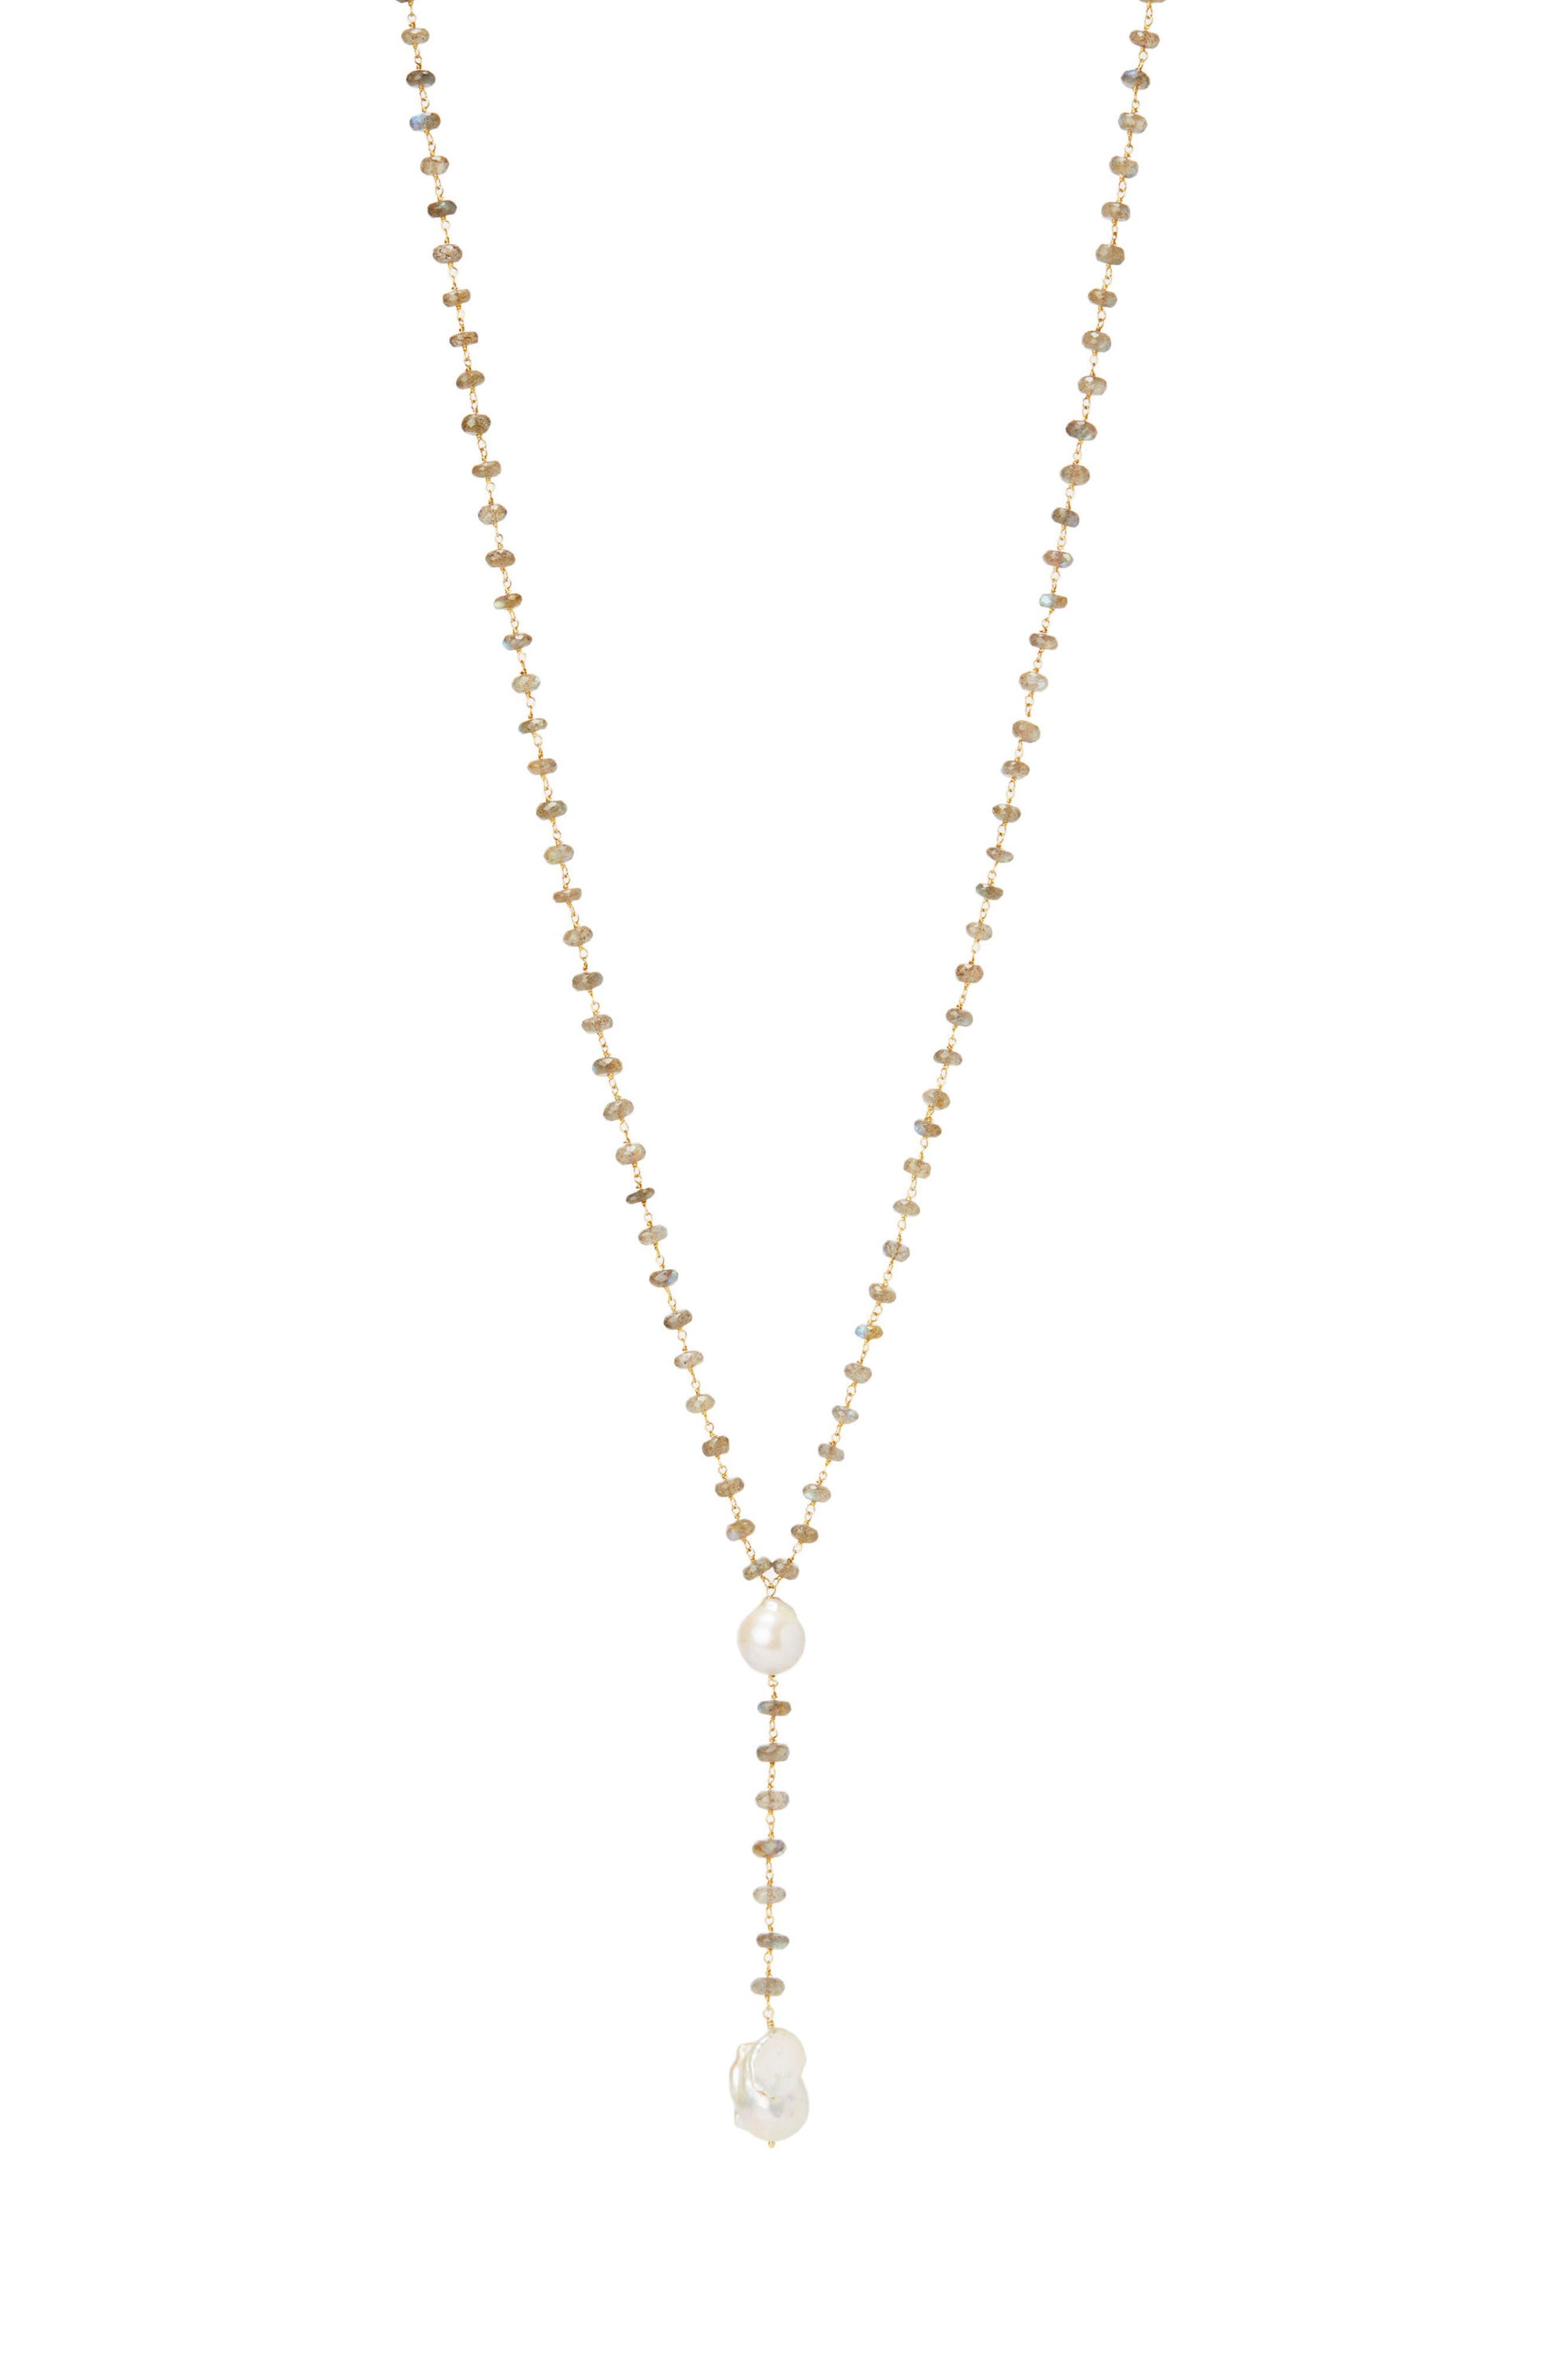 Bora Bora Semiprecious Stone & Baroque Pearl Y-Necklace,                             Main thumbnail 1, color,                             Labradorite